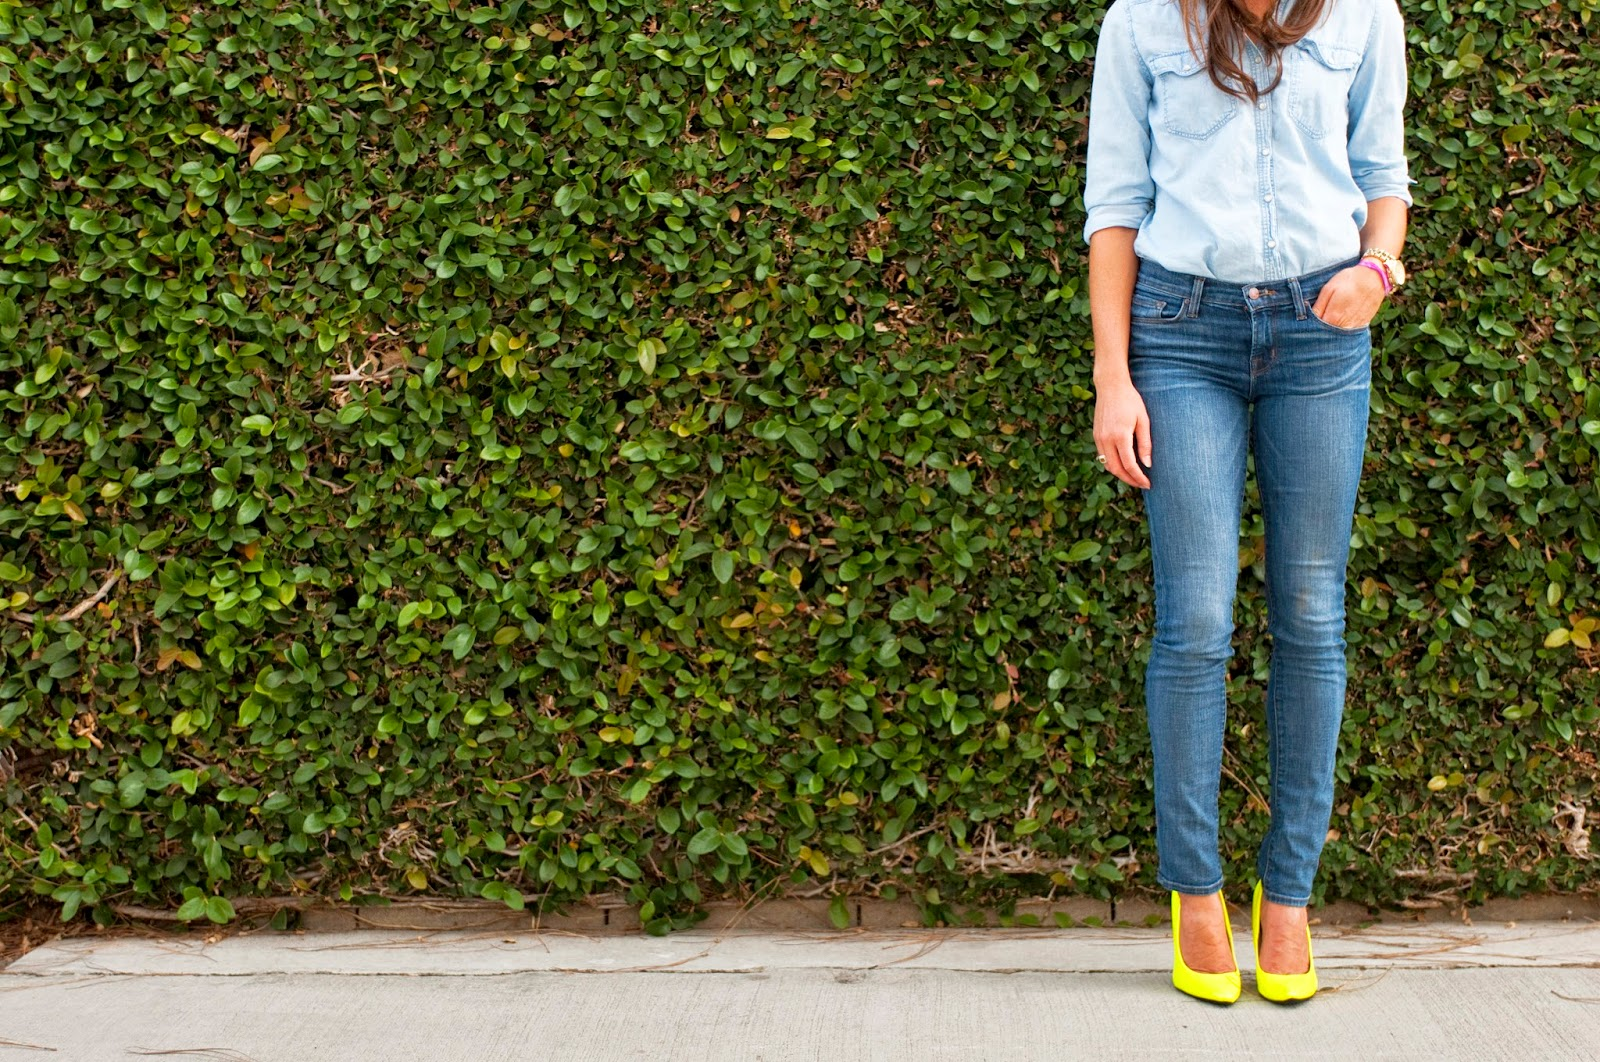 denim-no-denim-with-jbrand-jeans